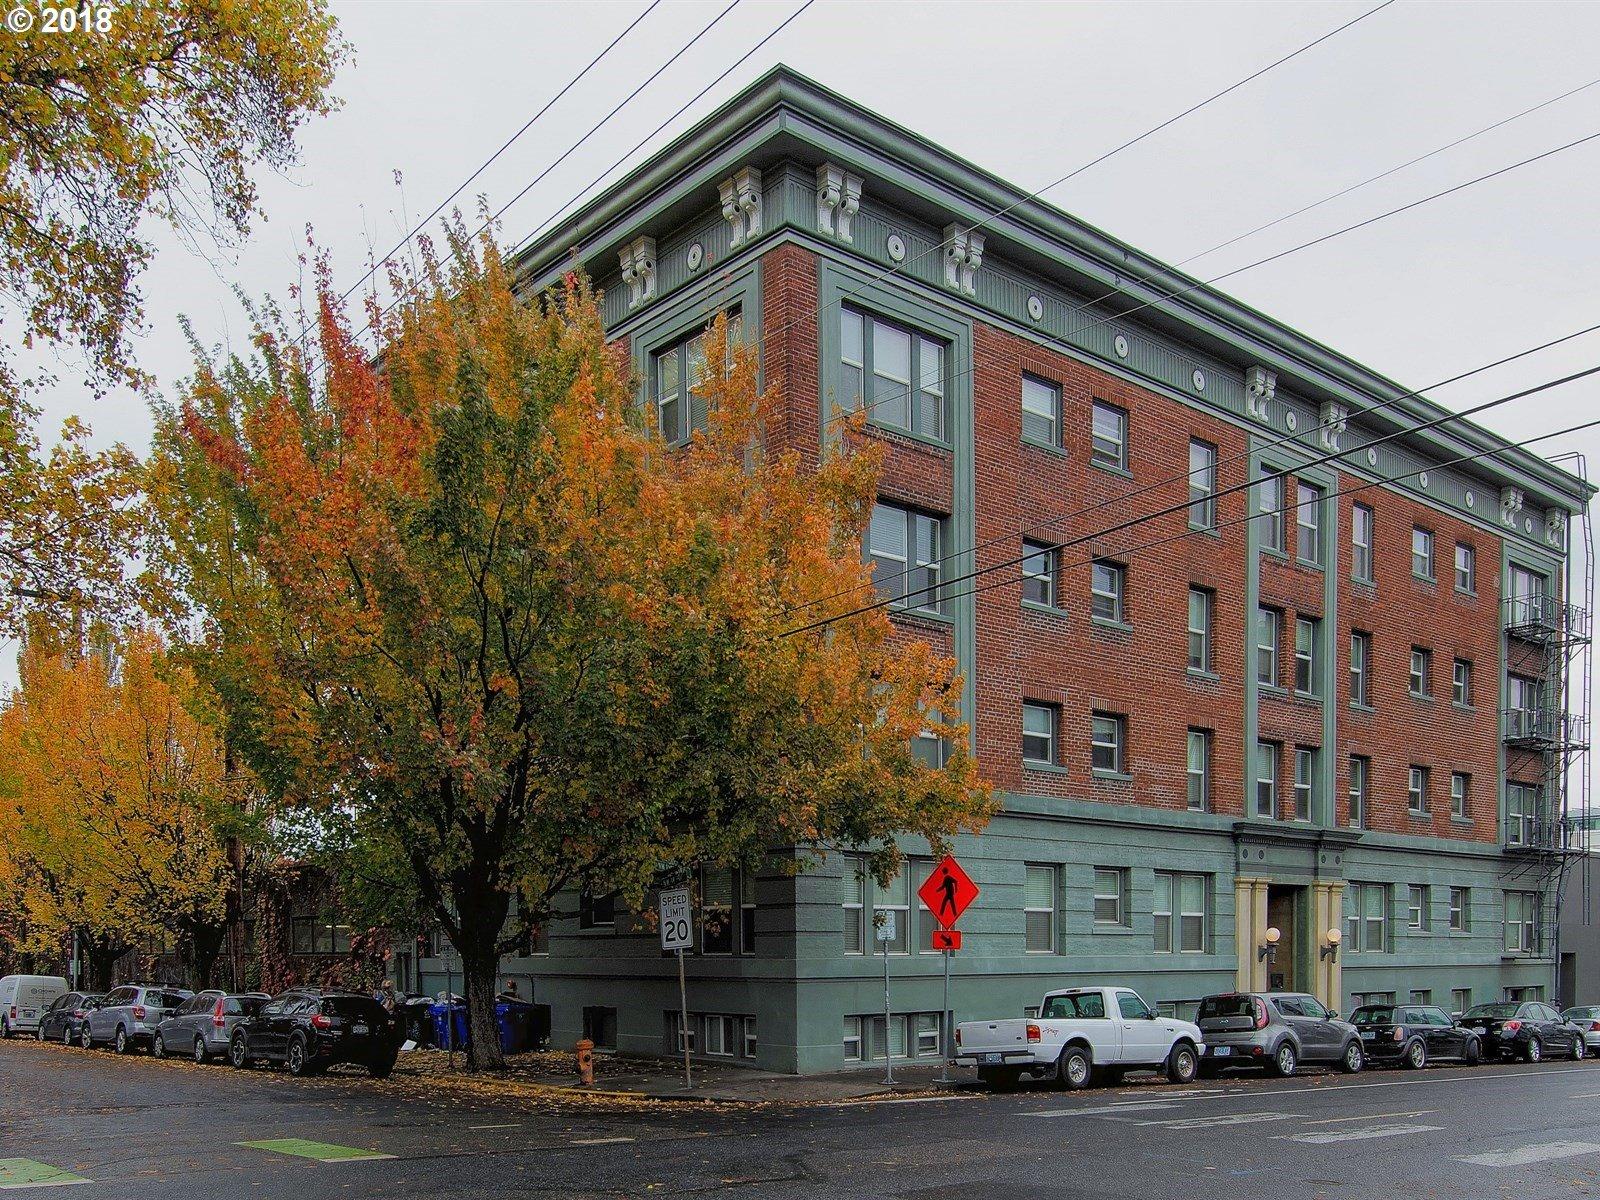 1631 NW EVERETT ST Unit 100 Portland, OR 97209 - MLS #: 18641626